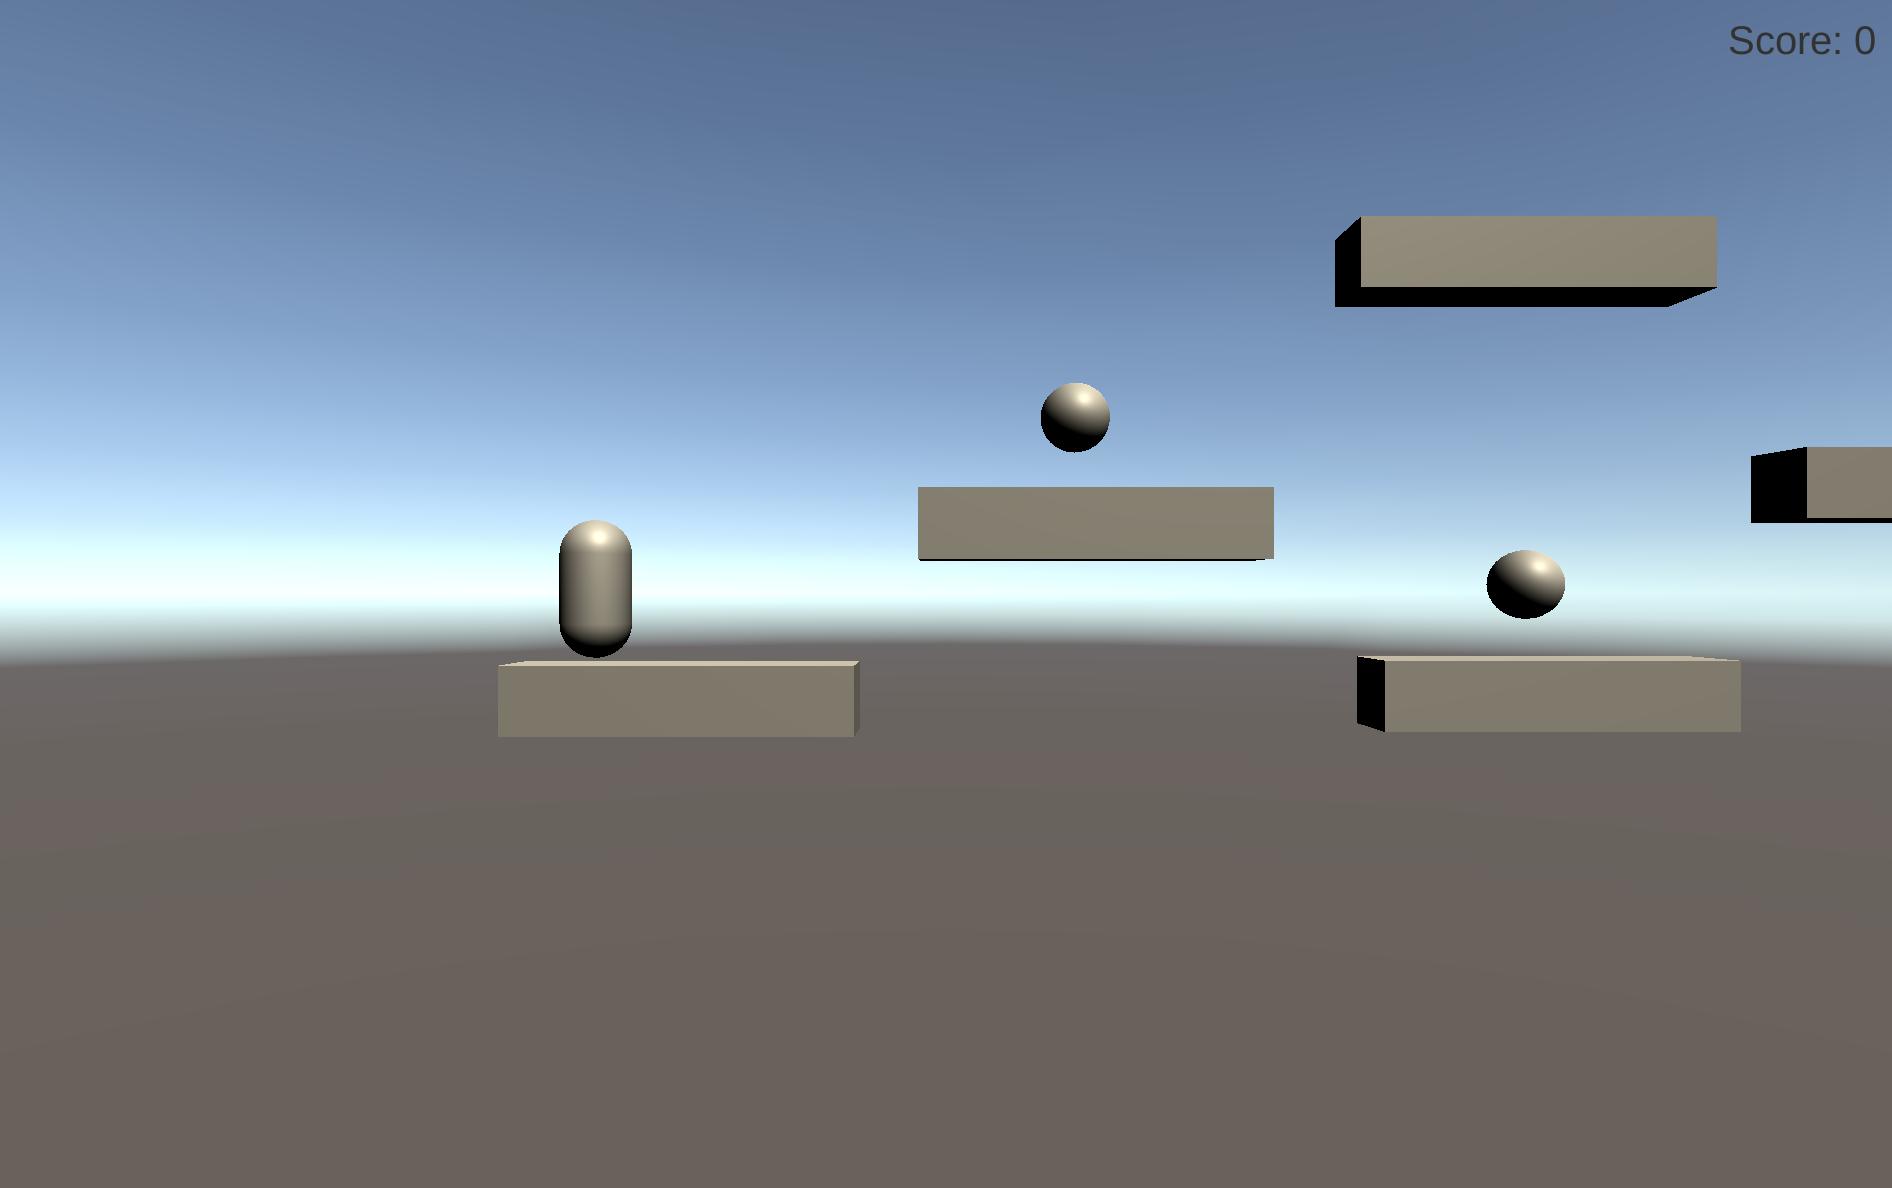 platformer prototype screenshot